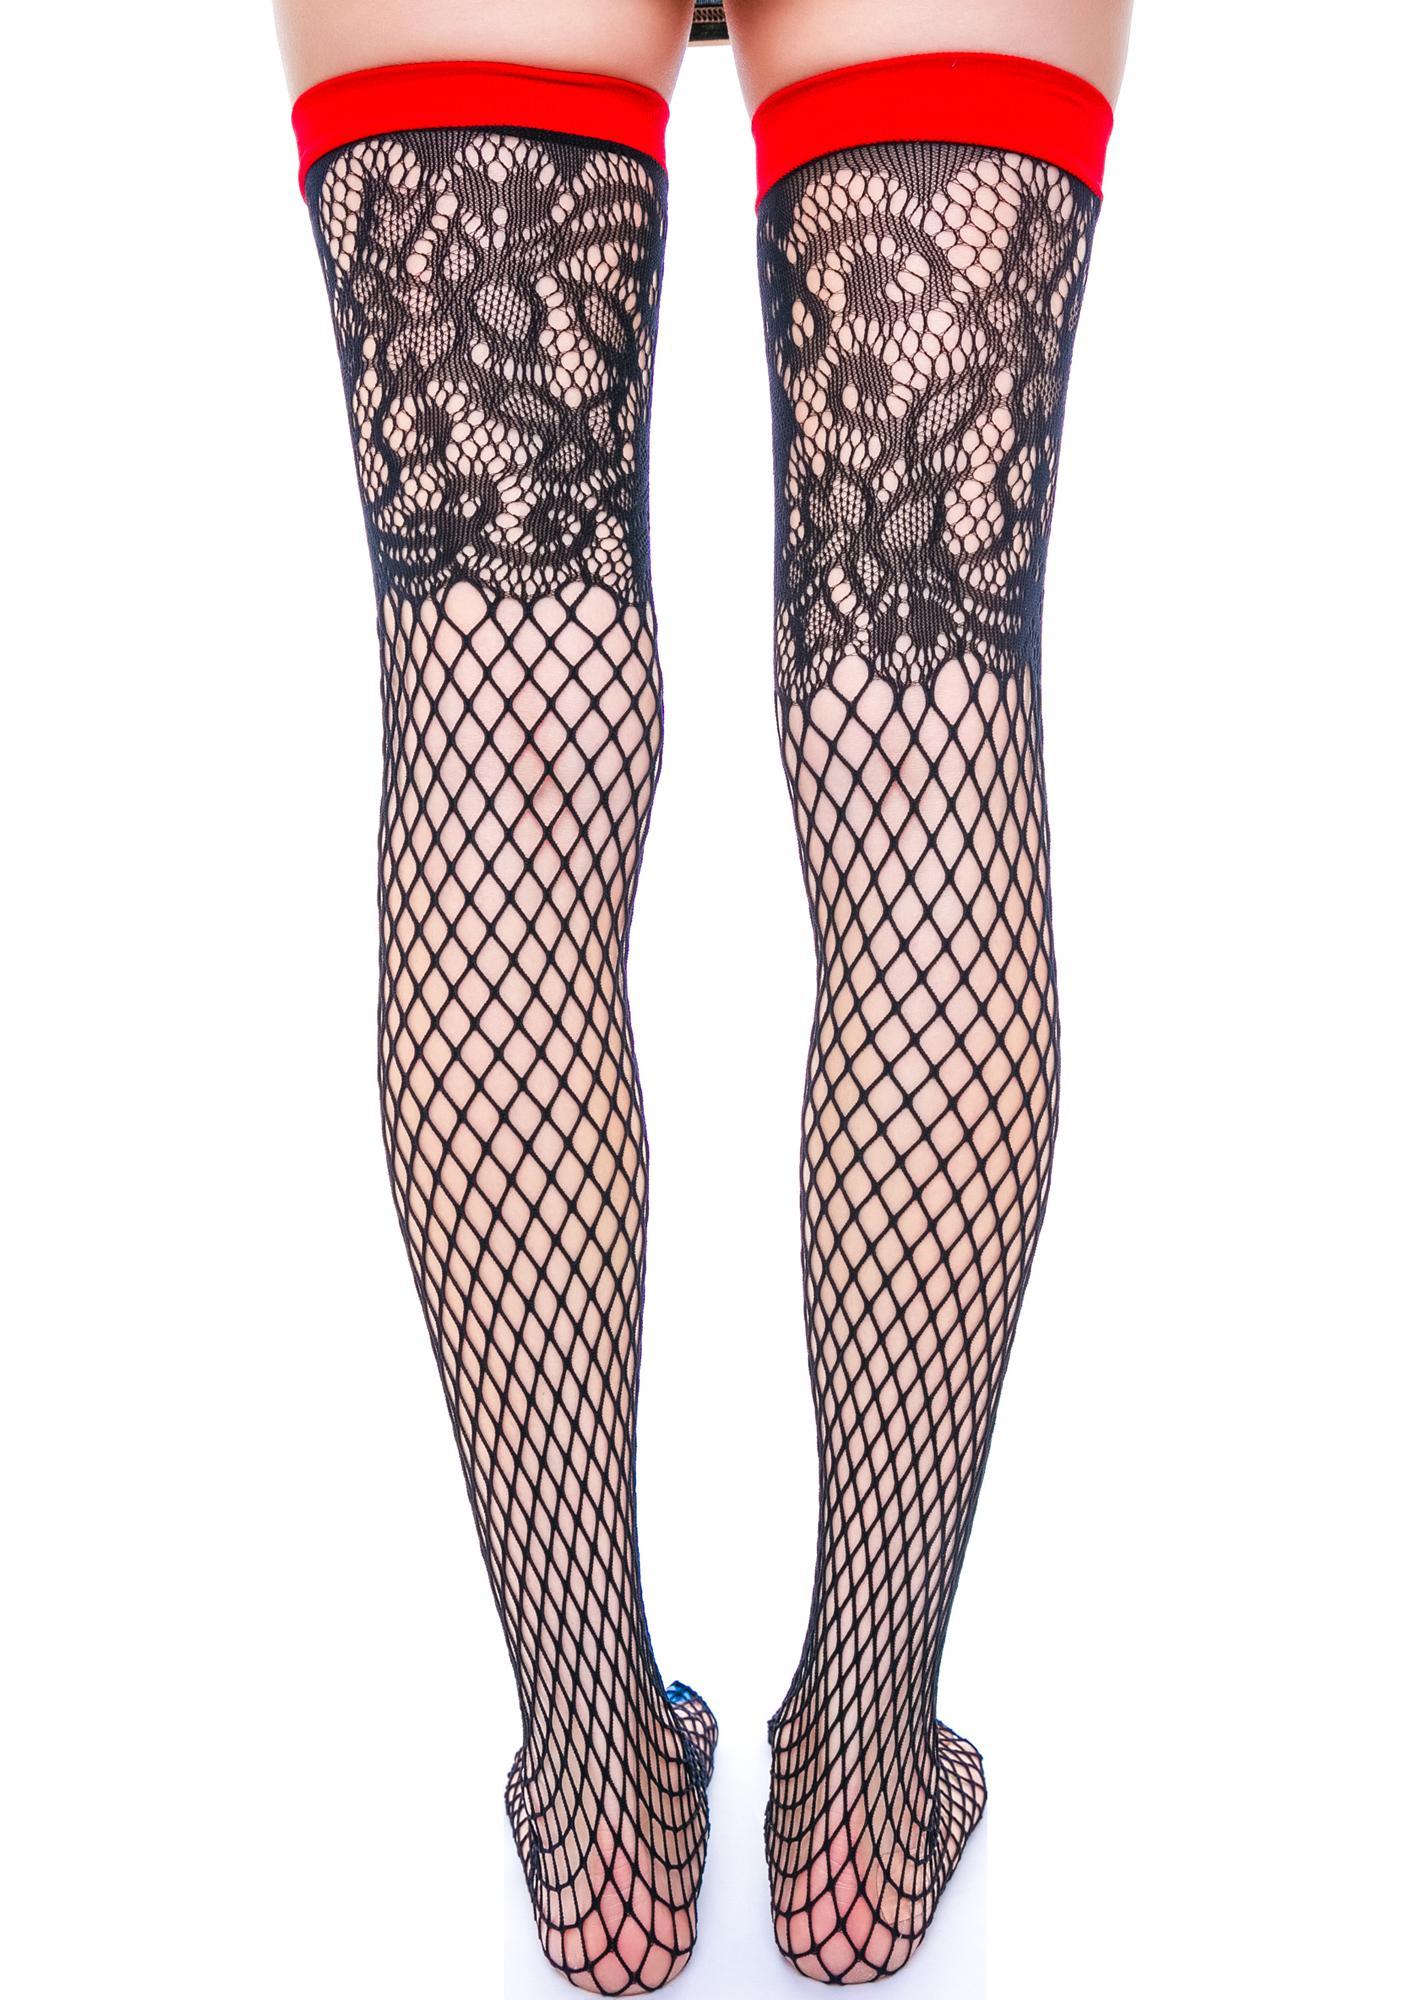 Speakeasy Lace Fishnet Thigh Highs